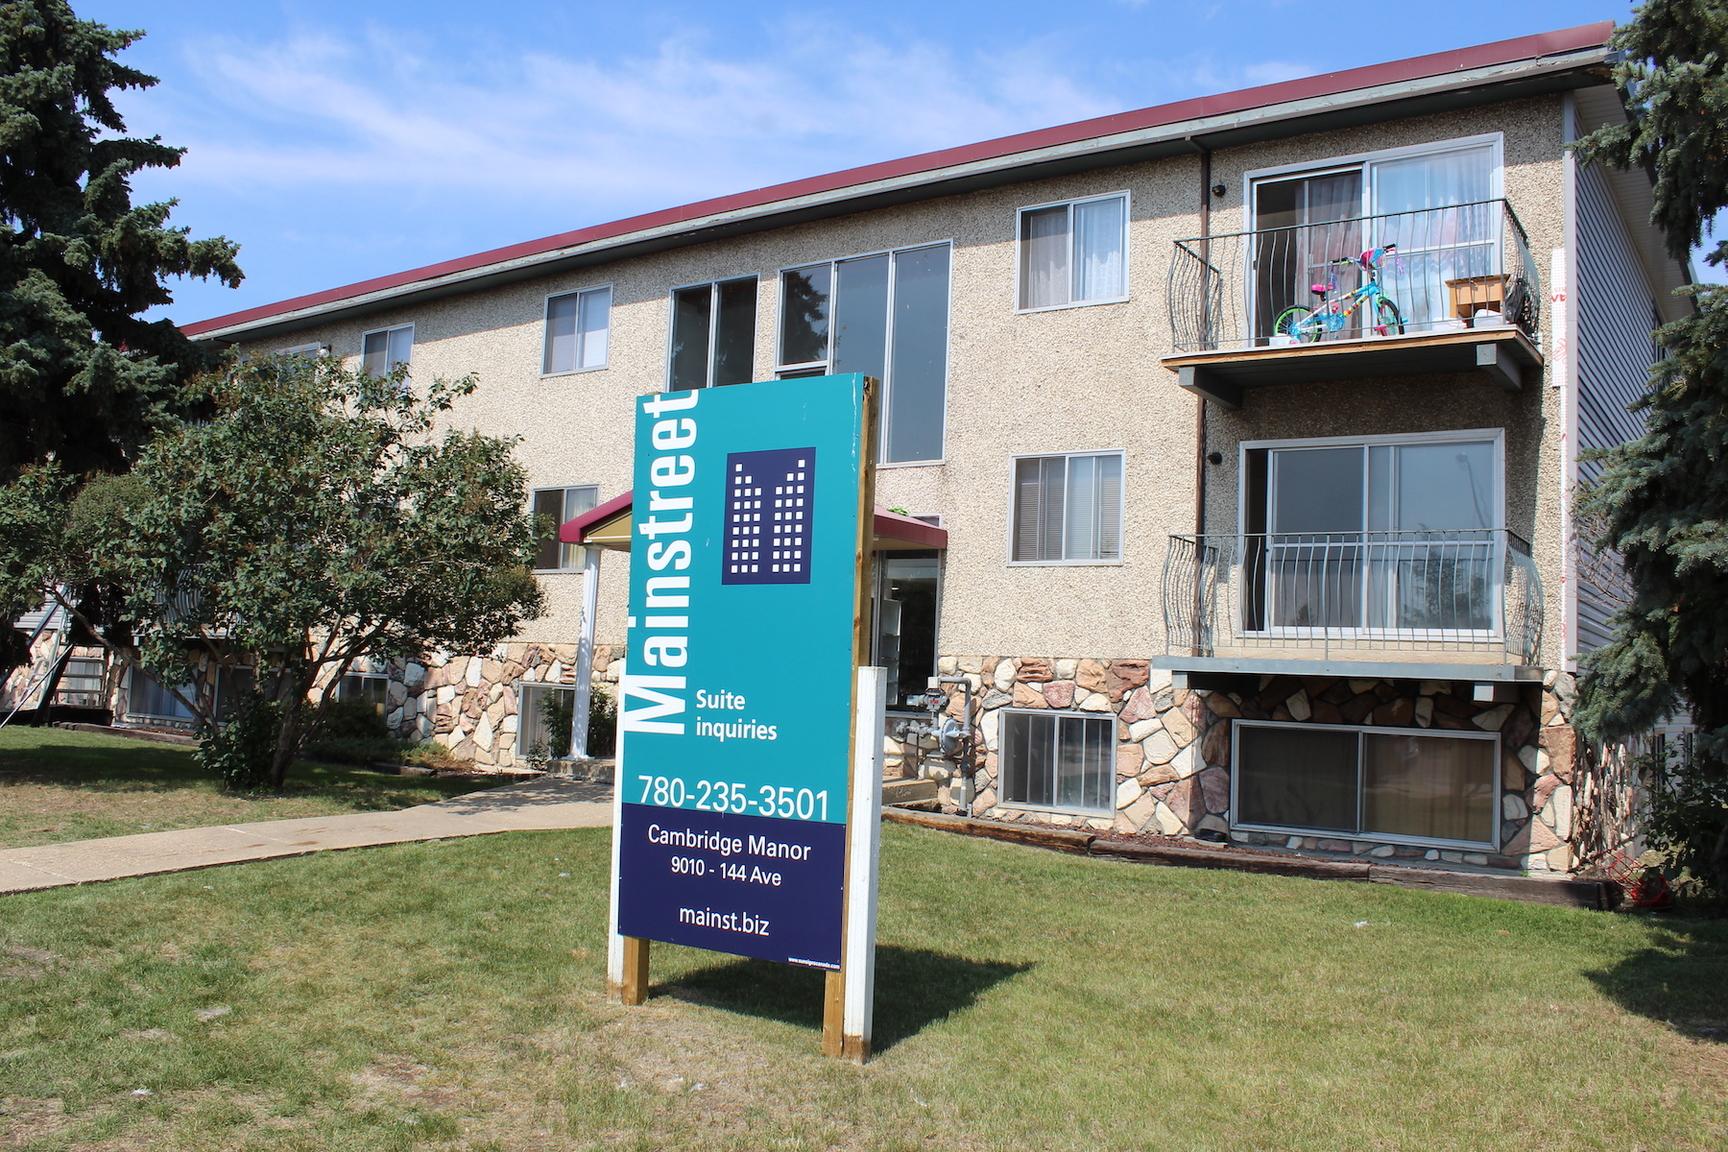 9010 144 Ave NW, Edmonton, AB - $1,050